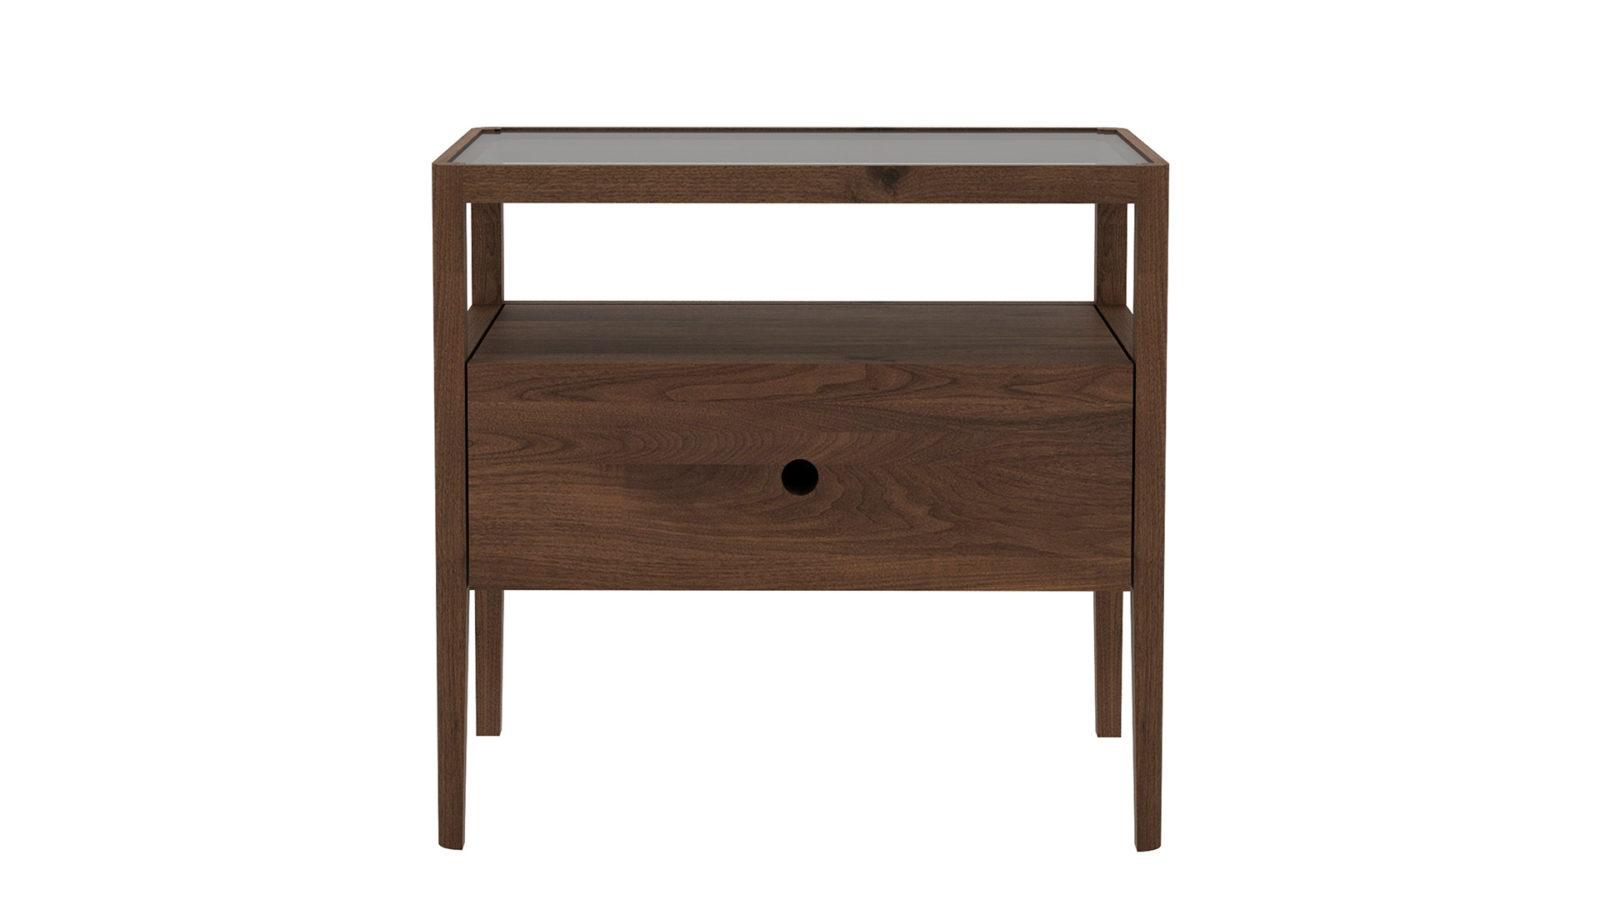 Ethnicraft-Spindle-bedside-table-Walnut